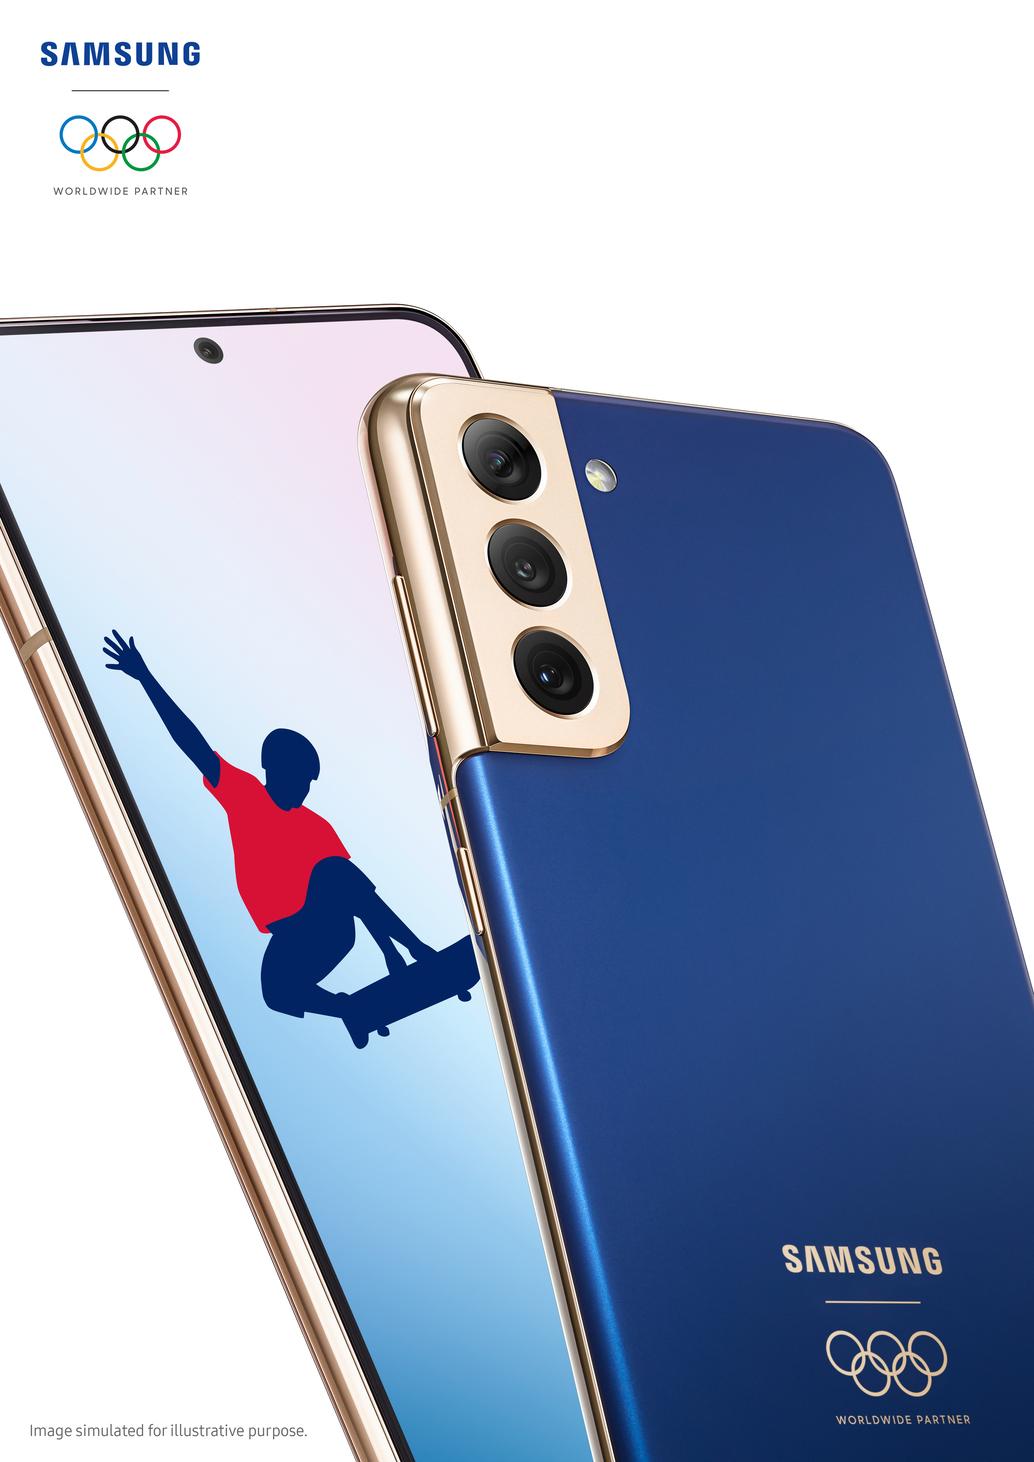 Galaxy S21 5G Tokyo 2020 Athlete Phone (2)